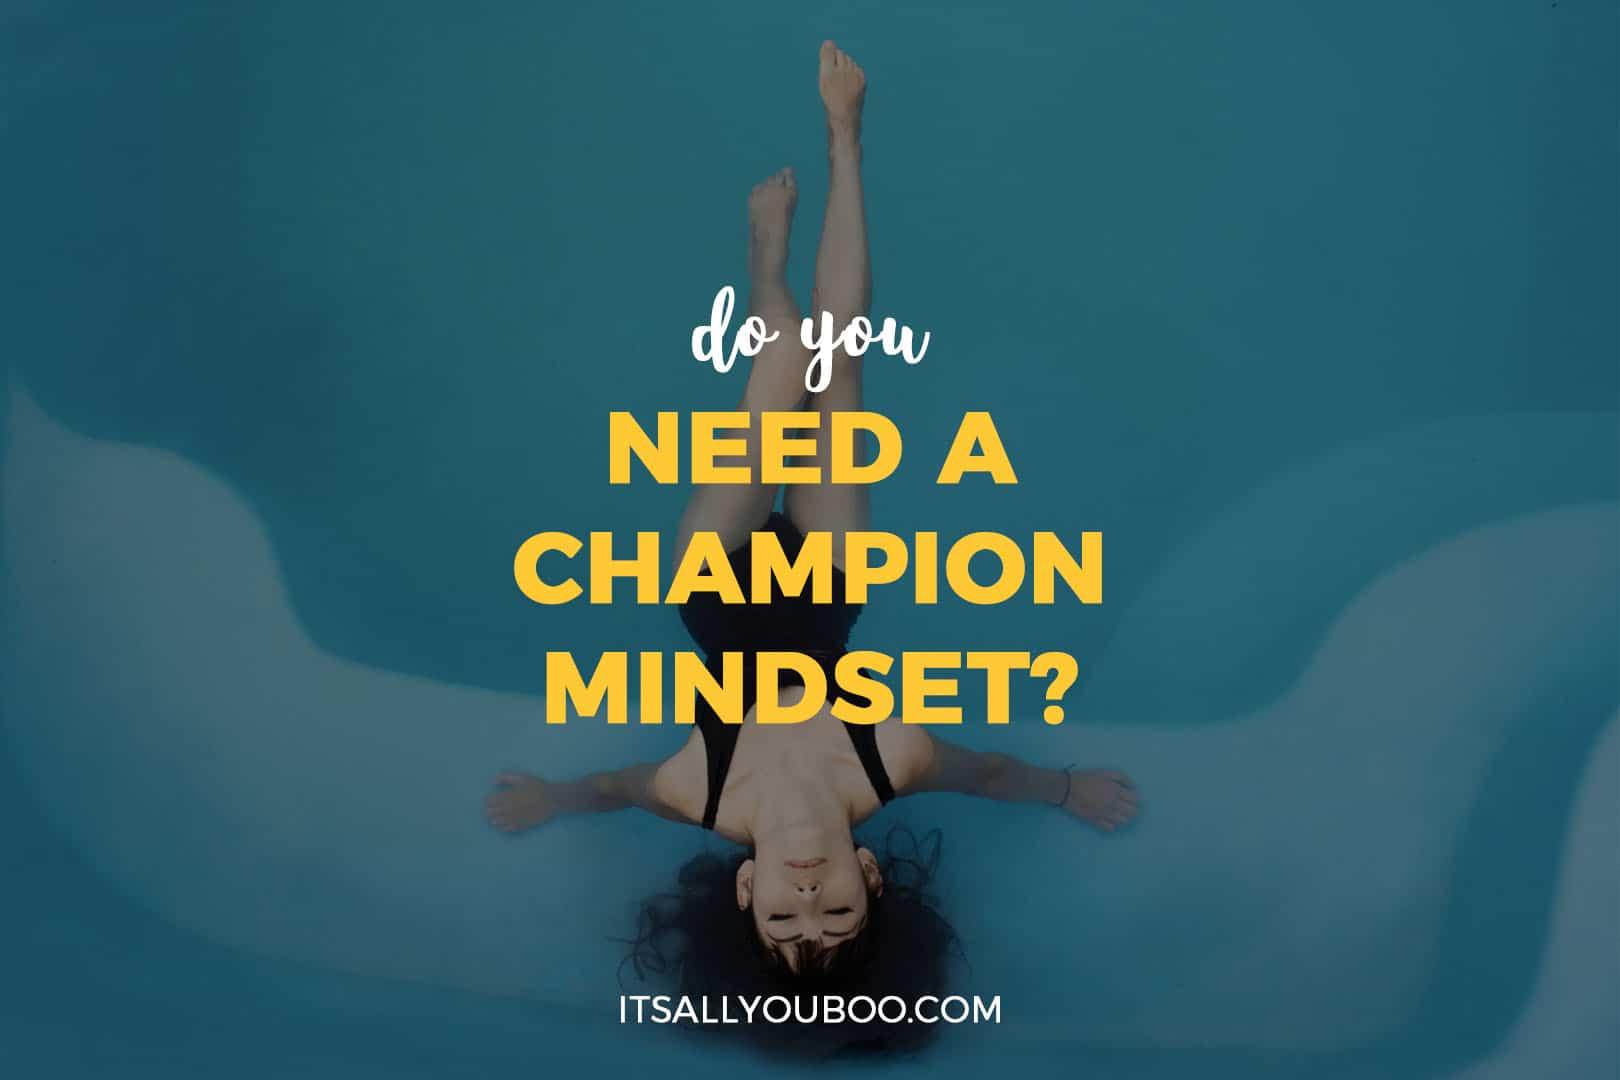 Do You Need A Champion Mindset?